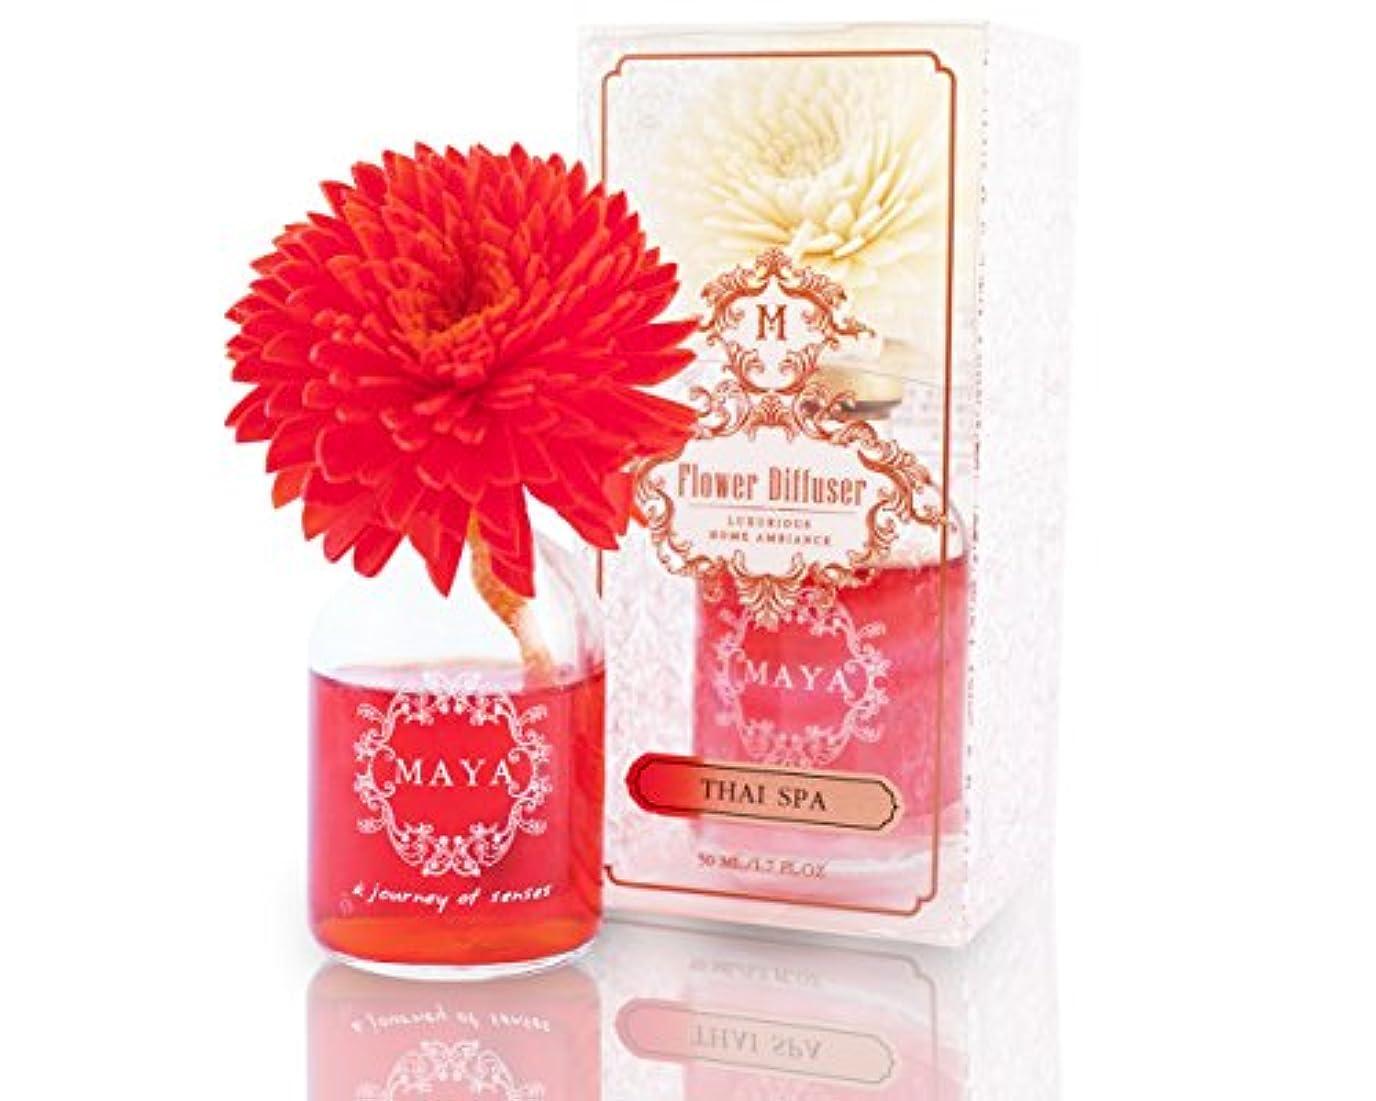 MAYA フラワーディフューザー タイスパ 50ml [並行輸入品] |Aroma Flower Diffuser THAI SPA 50ml